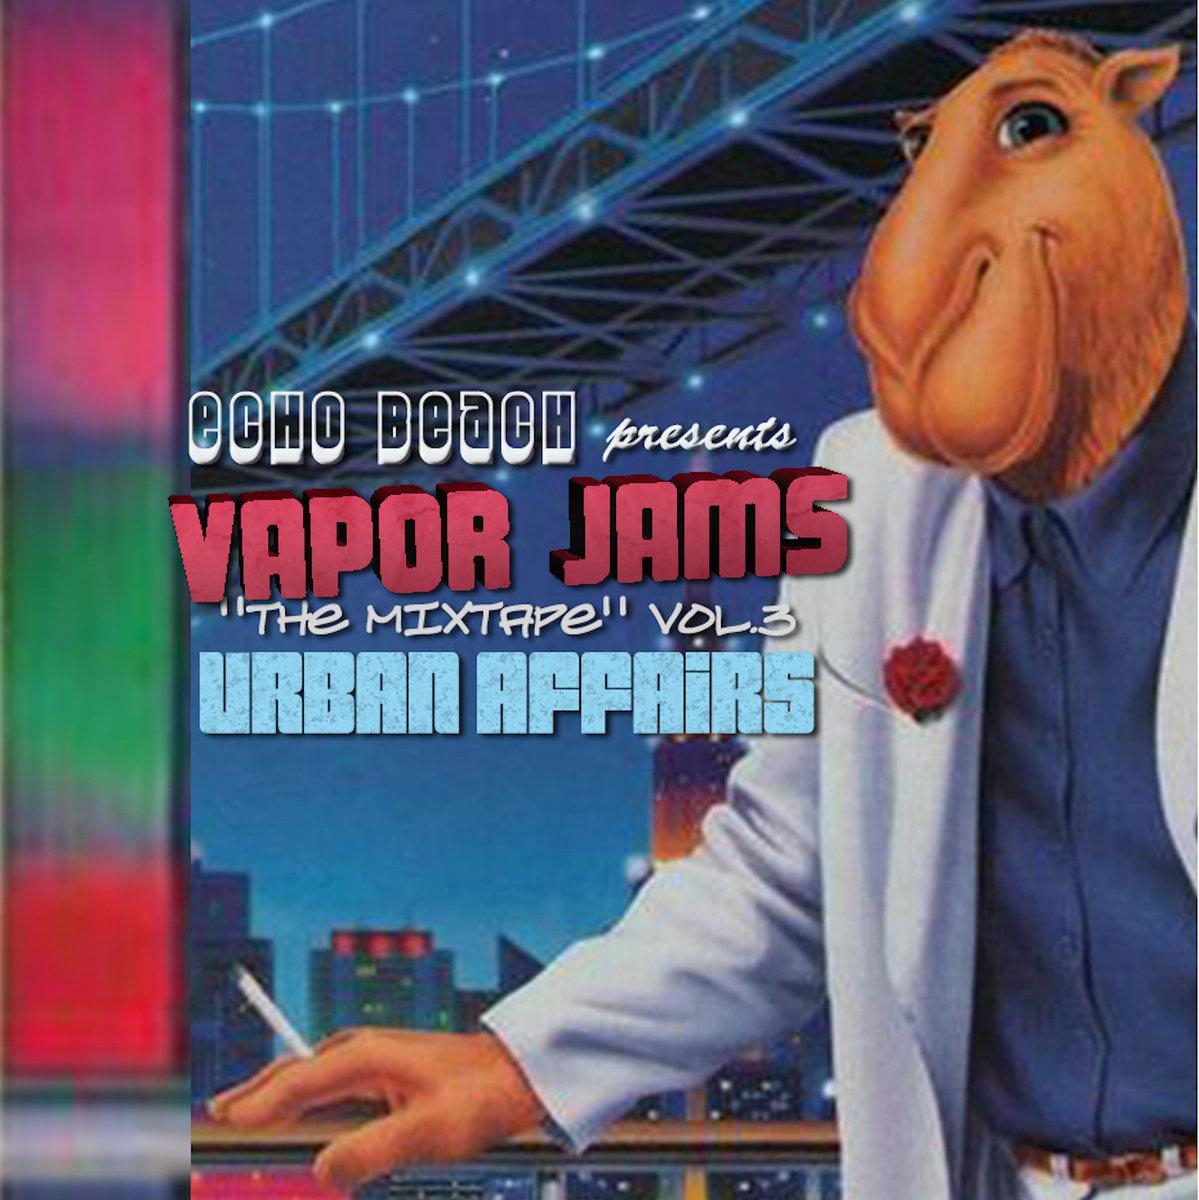 From Vapor Jams The Mixtape Vol 3 URBAN AFFAIRS By Echo Beach